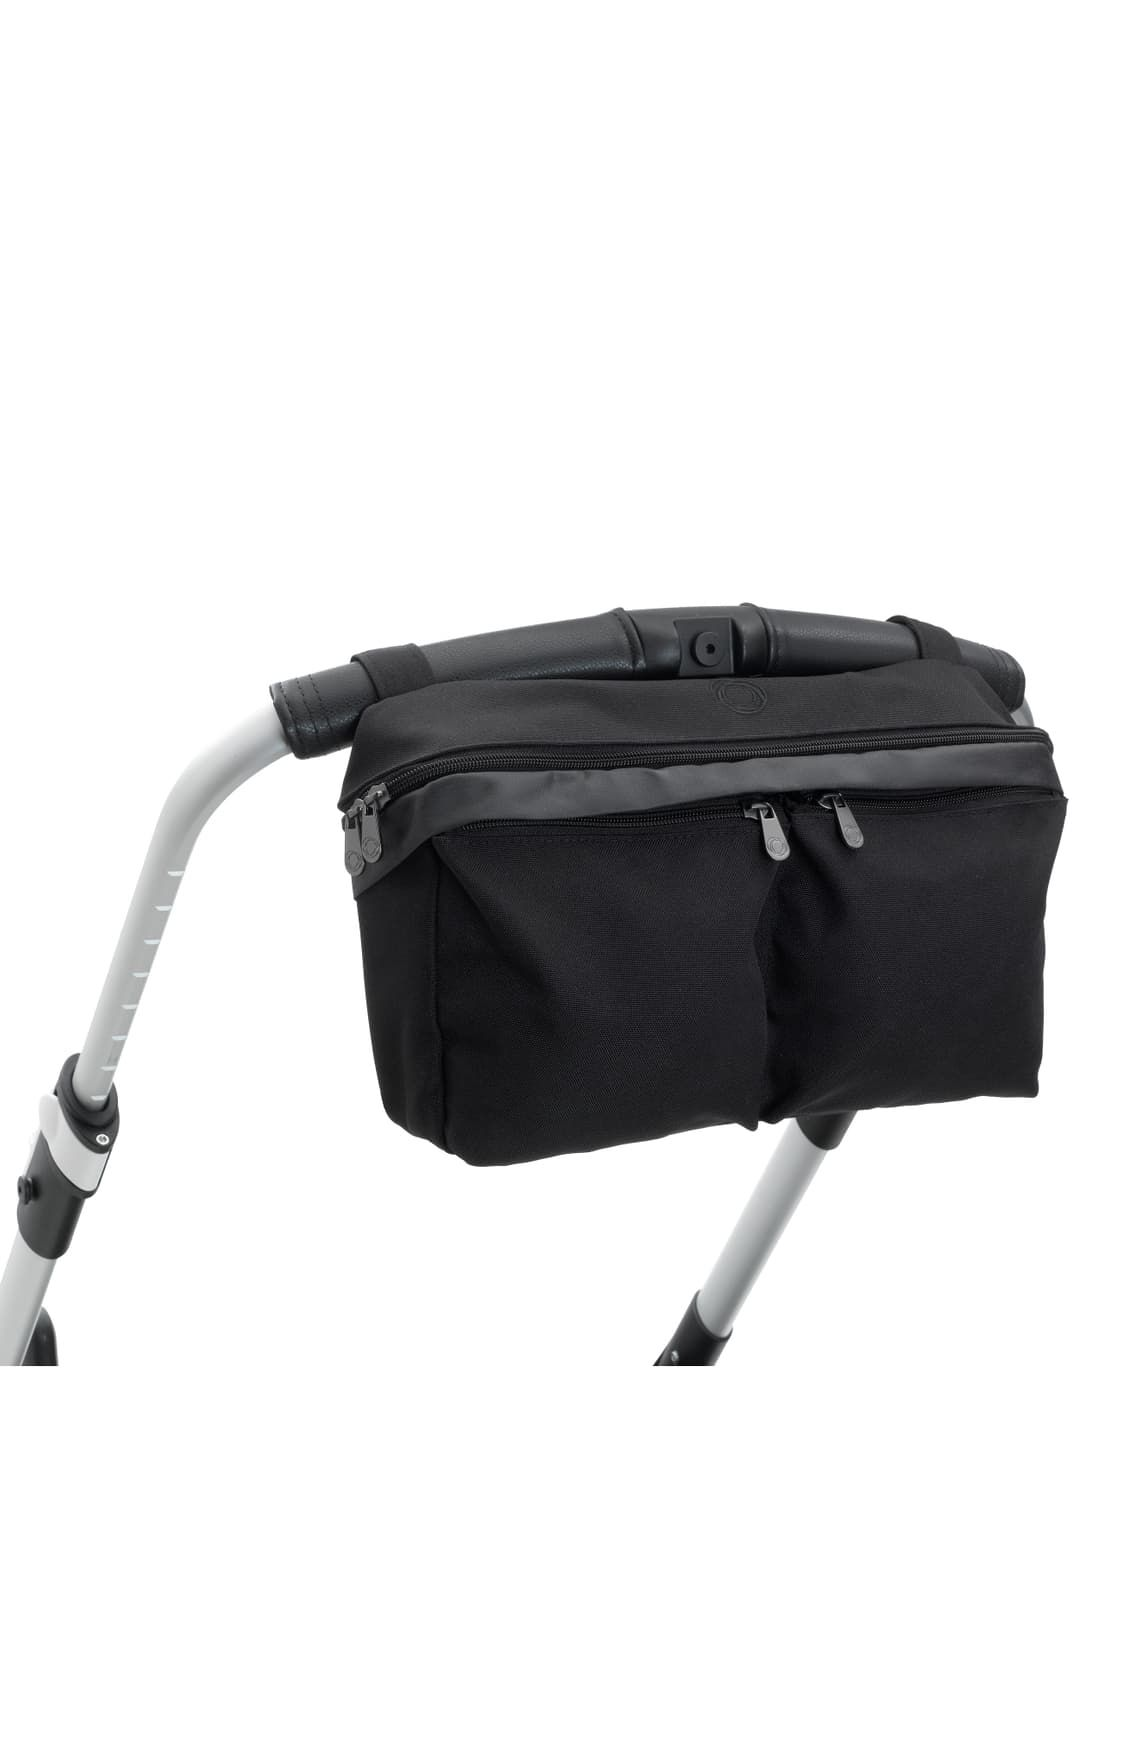 35+ Bugaboo stroller organizer black ideas in 2021